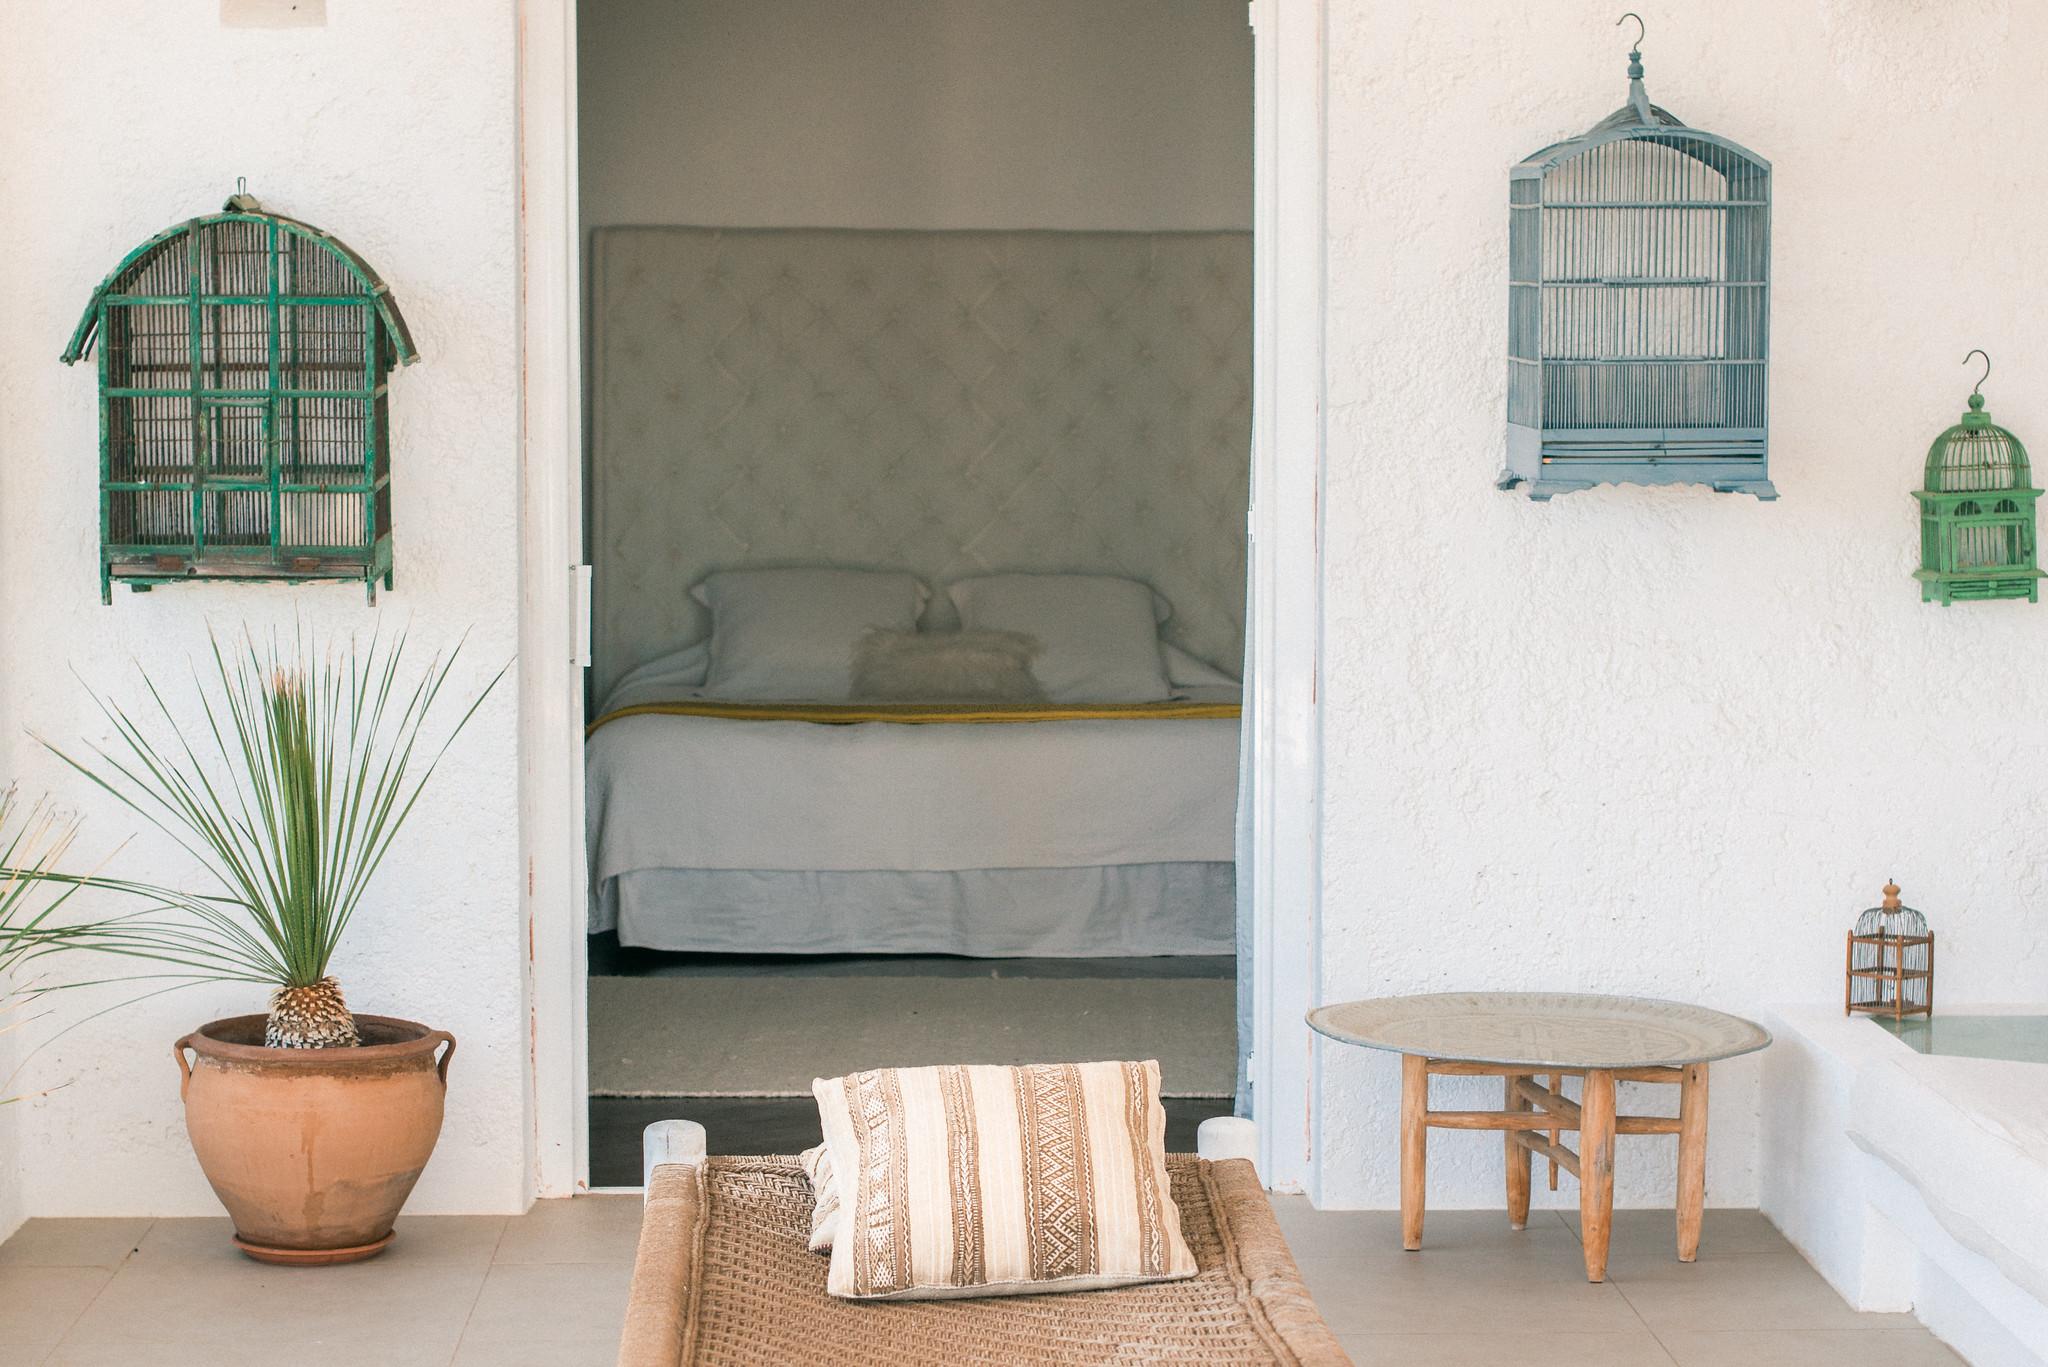 https://www.white-ibiza.com/wp-content/uploads/2020/06/white-ibiza-villas-casa-odette-exterior-looking-in.jpg